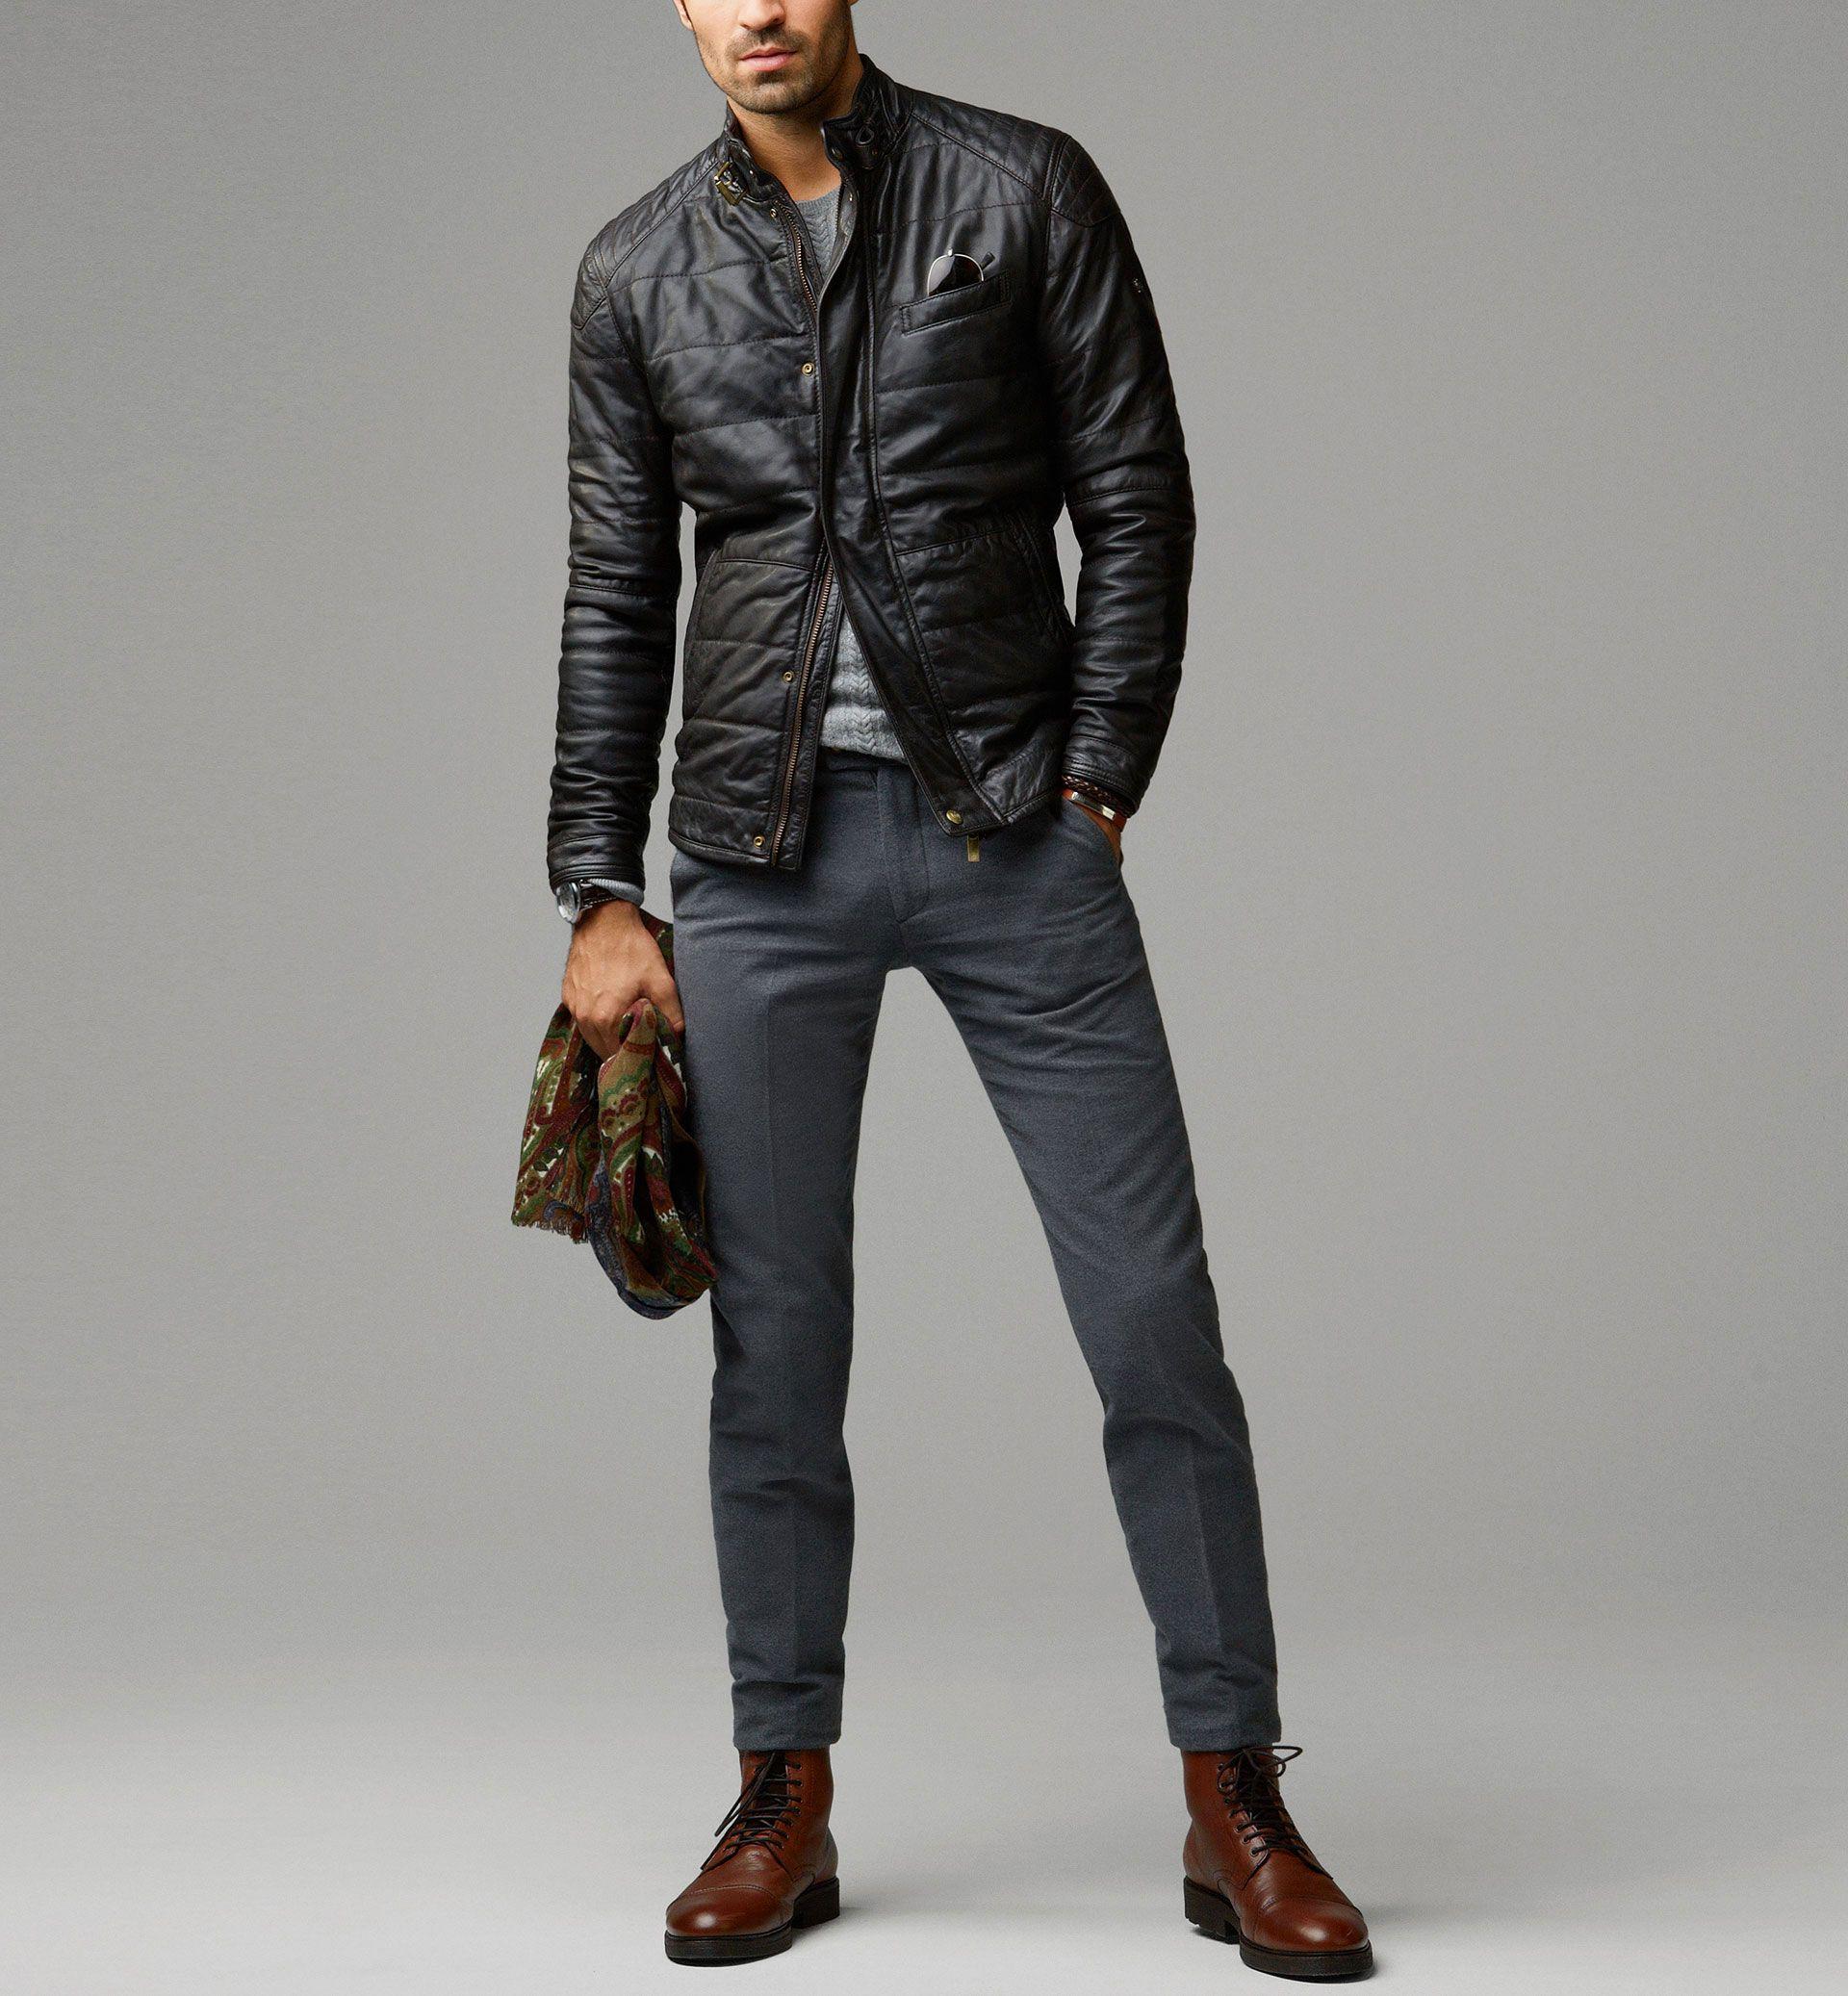 Massimo Dutti Nappa Leather Jacket Leather Jacket Men Leather Jacket Men Style Mens Fashion Casual [ 2074 x 1920 Pixel ]